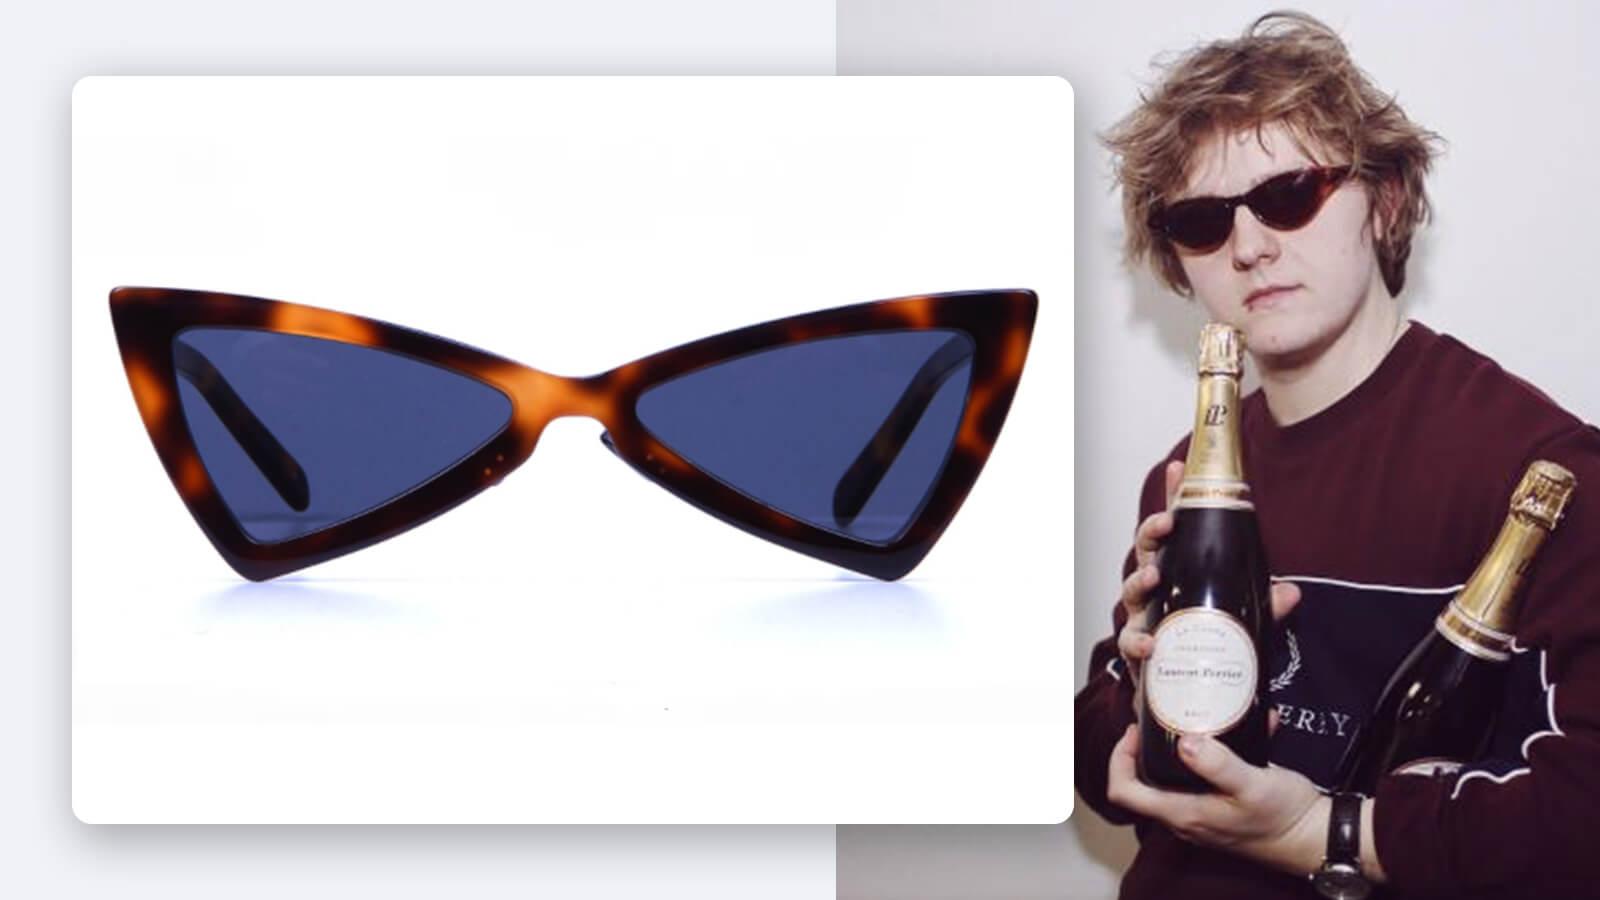 Browner and Shinier: Lewis Capaldi Brown Tortoiseshell sunglasses